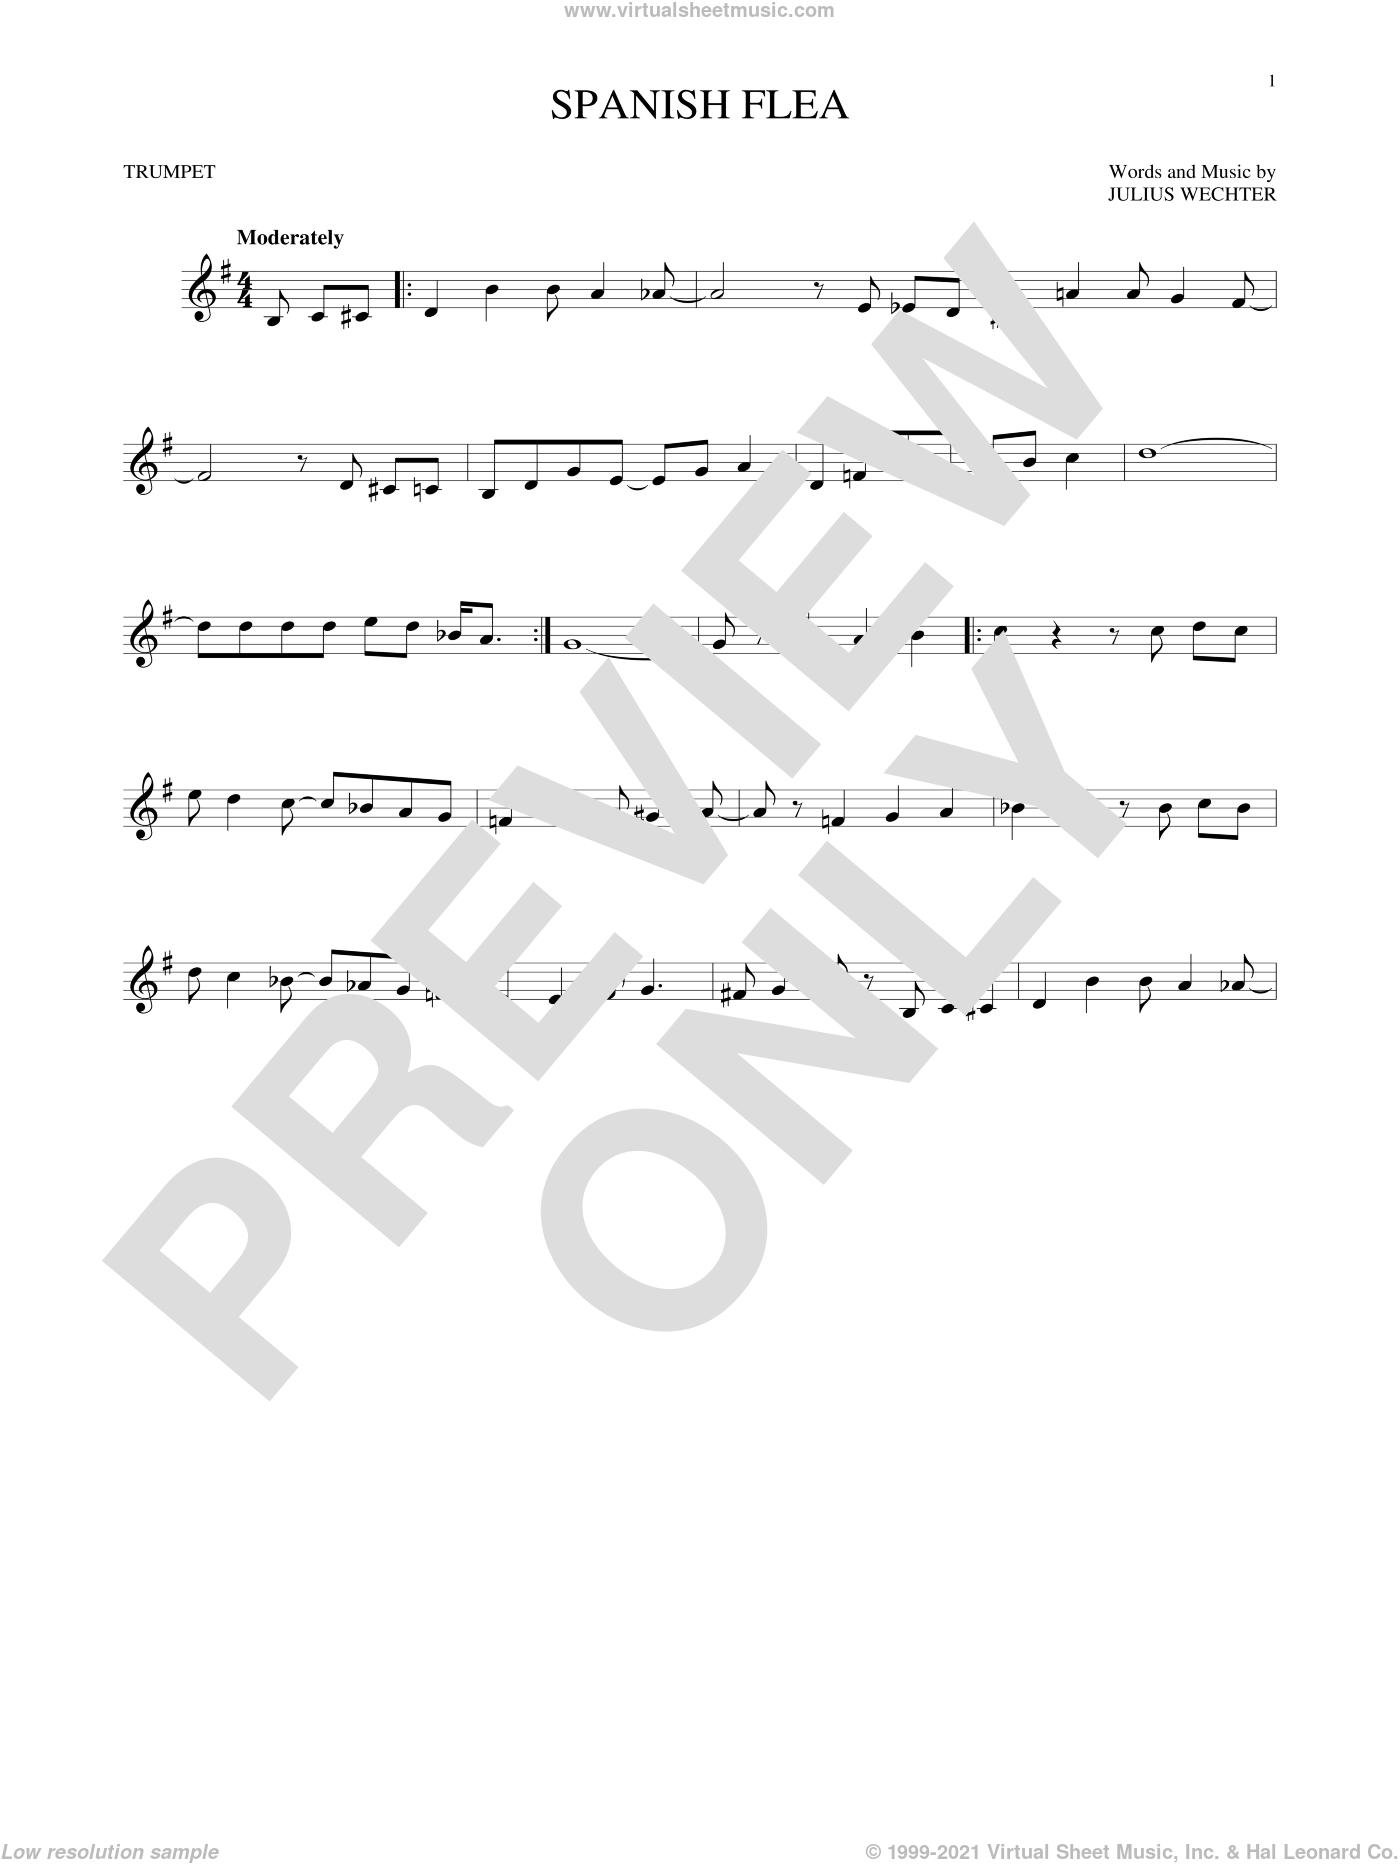 Spanish Flea sheet music for trumpet solo by Herb Alpert & The Tijuana Brass and Julius Wechter, intermediate skill level